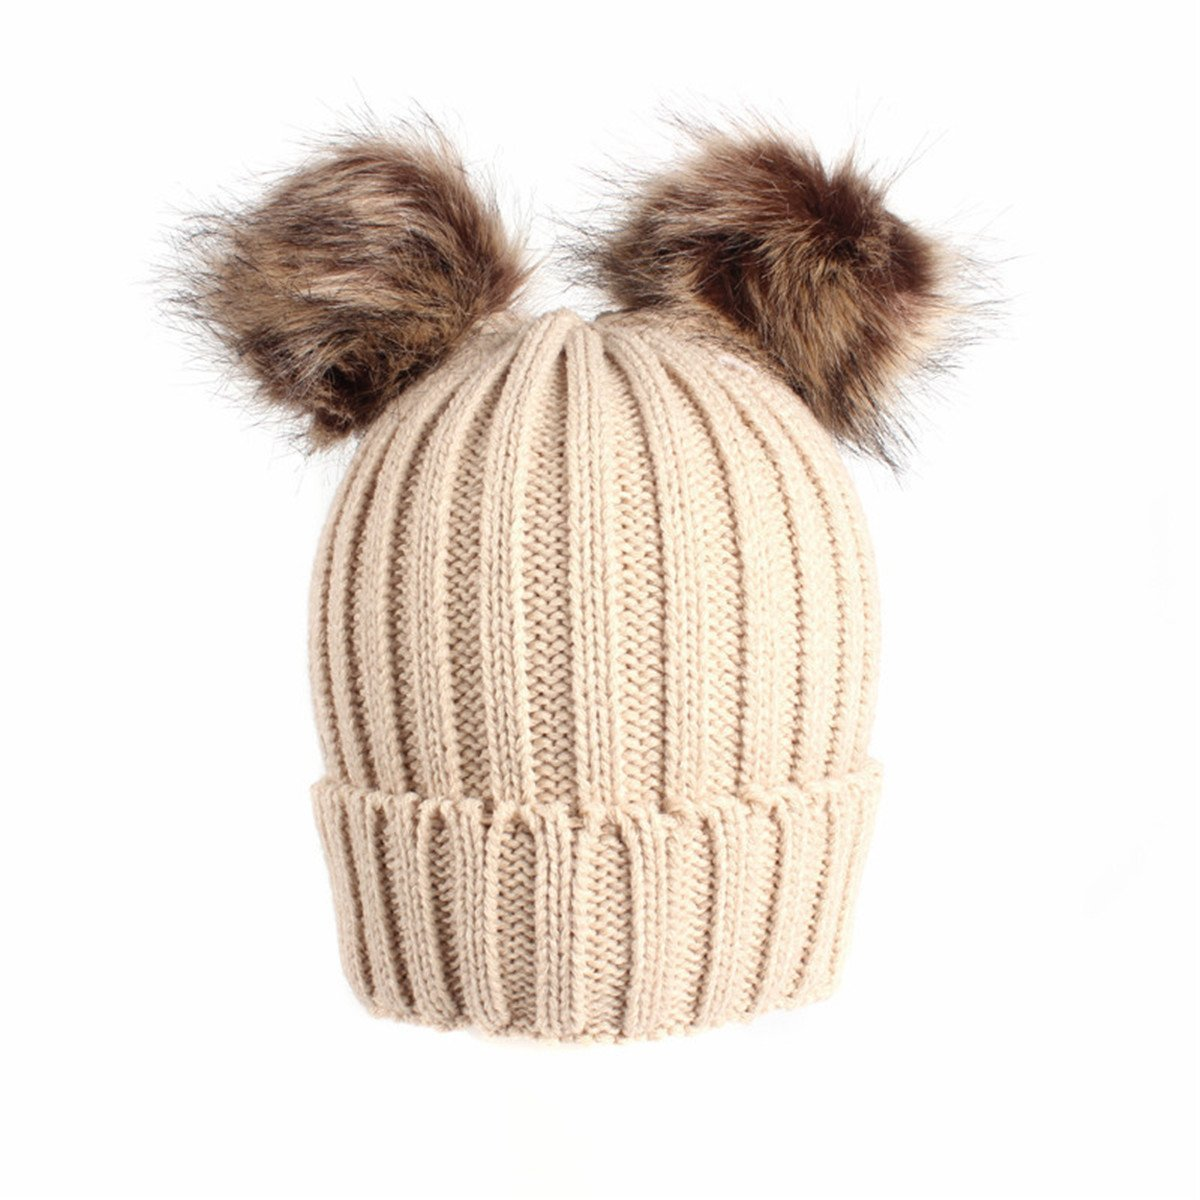 Qhome Kids Winter Warm Beanie Hat With Pom Pom Children Beanies Knitted Hats